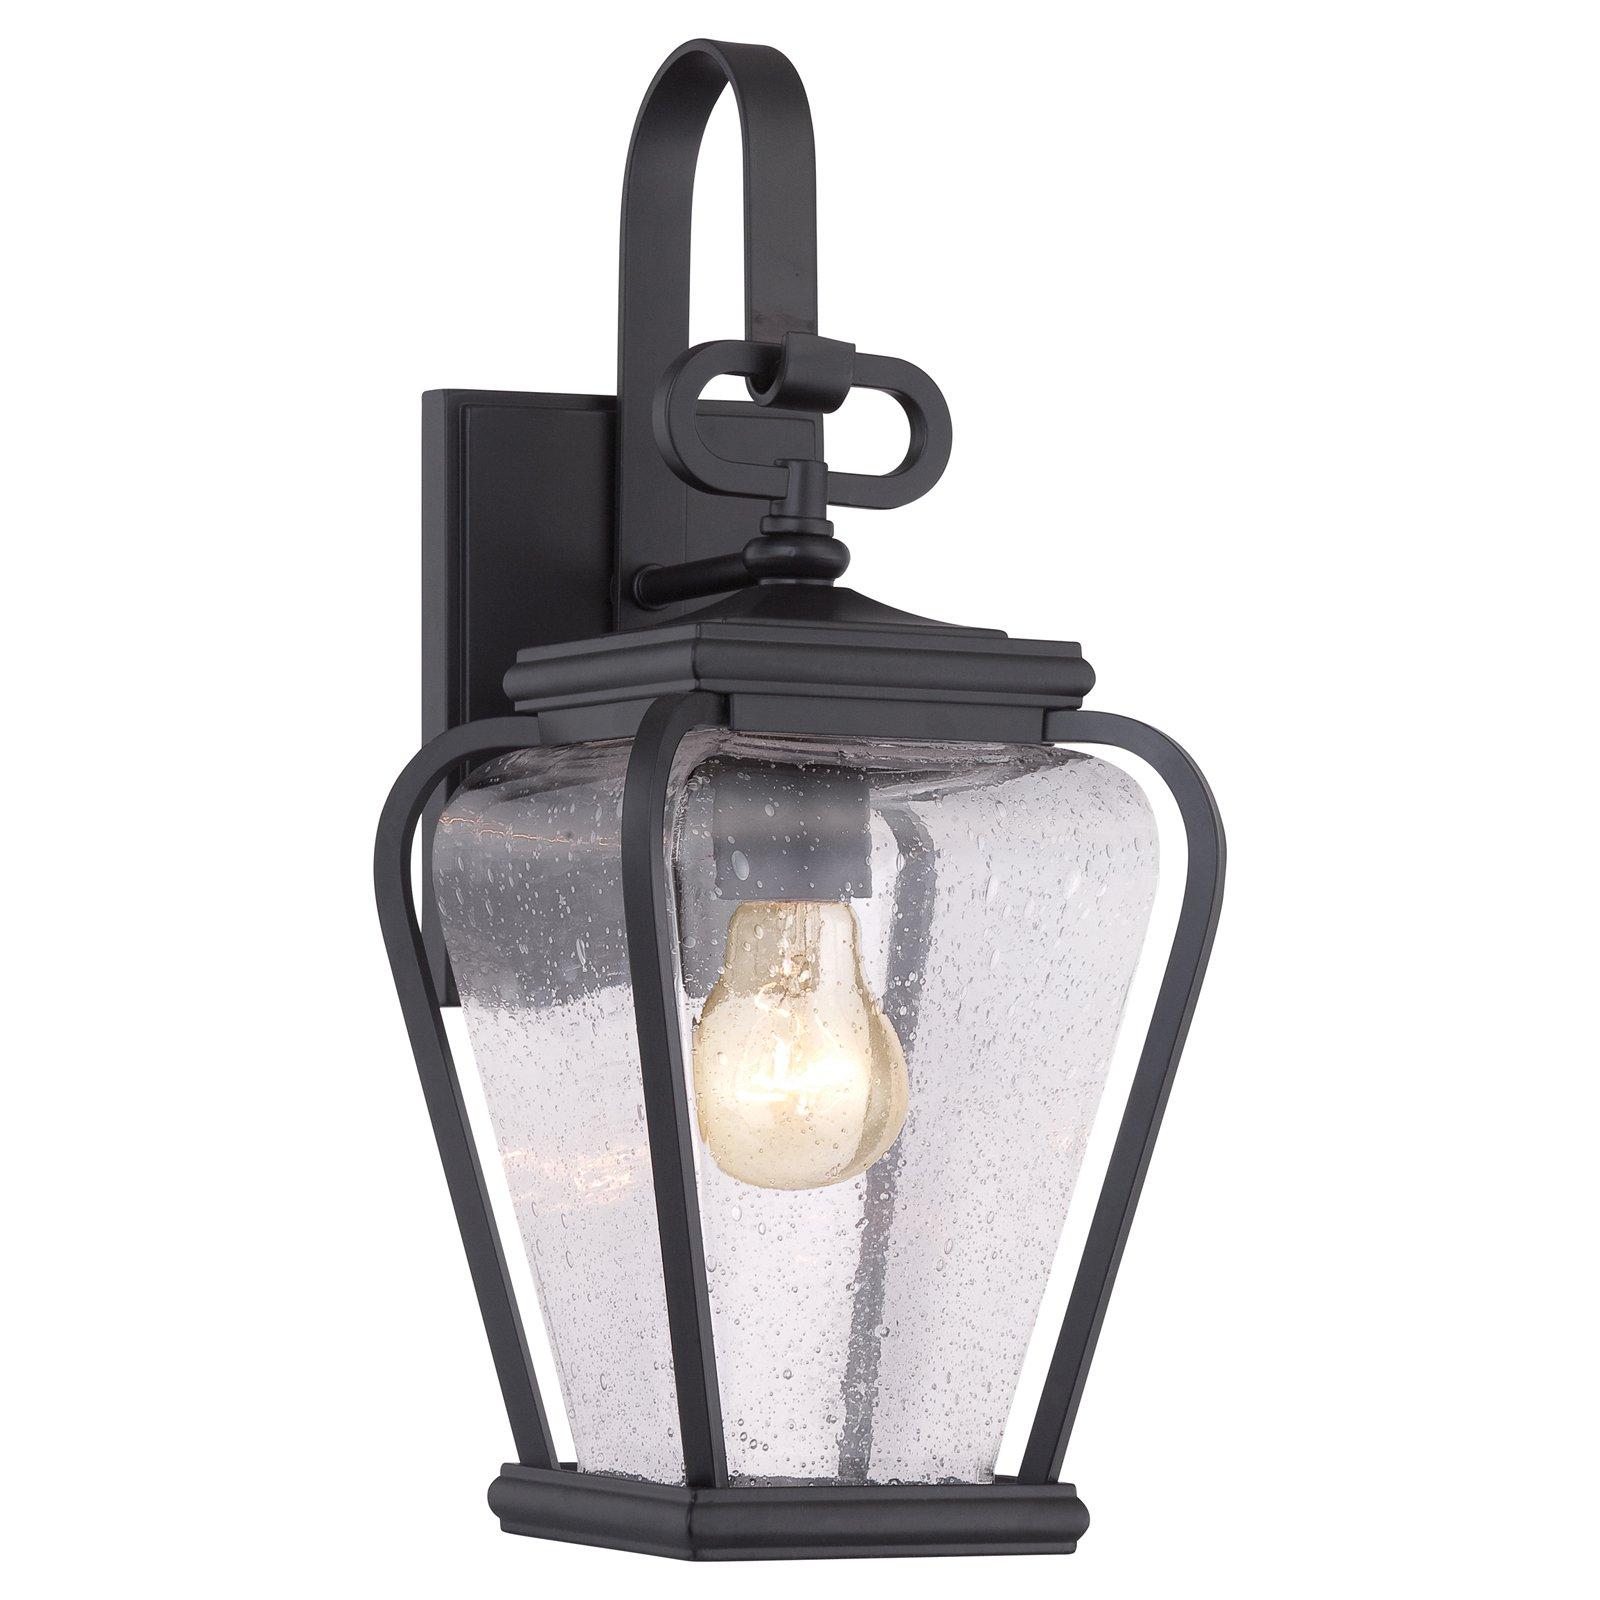 Quoizel Province PRV8406K Outdoor Wall Lantern